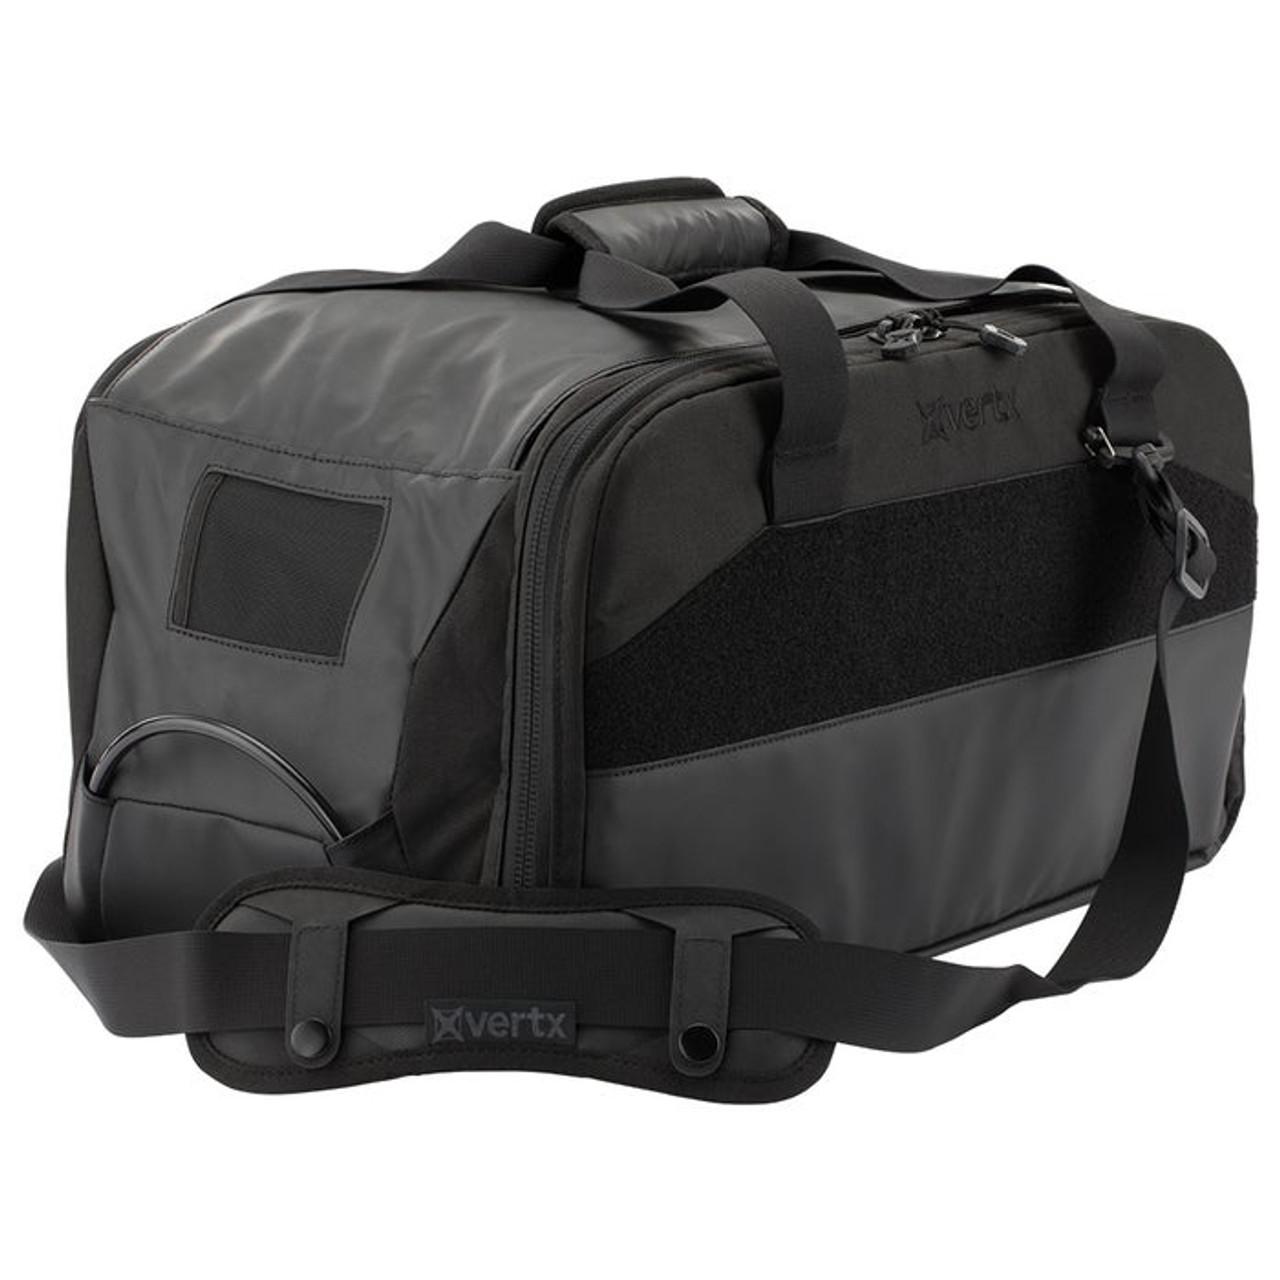 Vertx COF Heavy Range Bag (Heather Black/Galaxy Black)